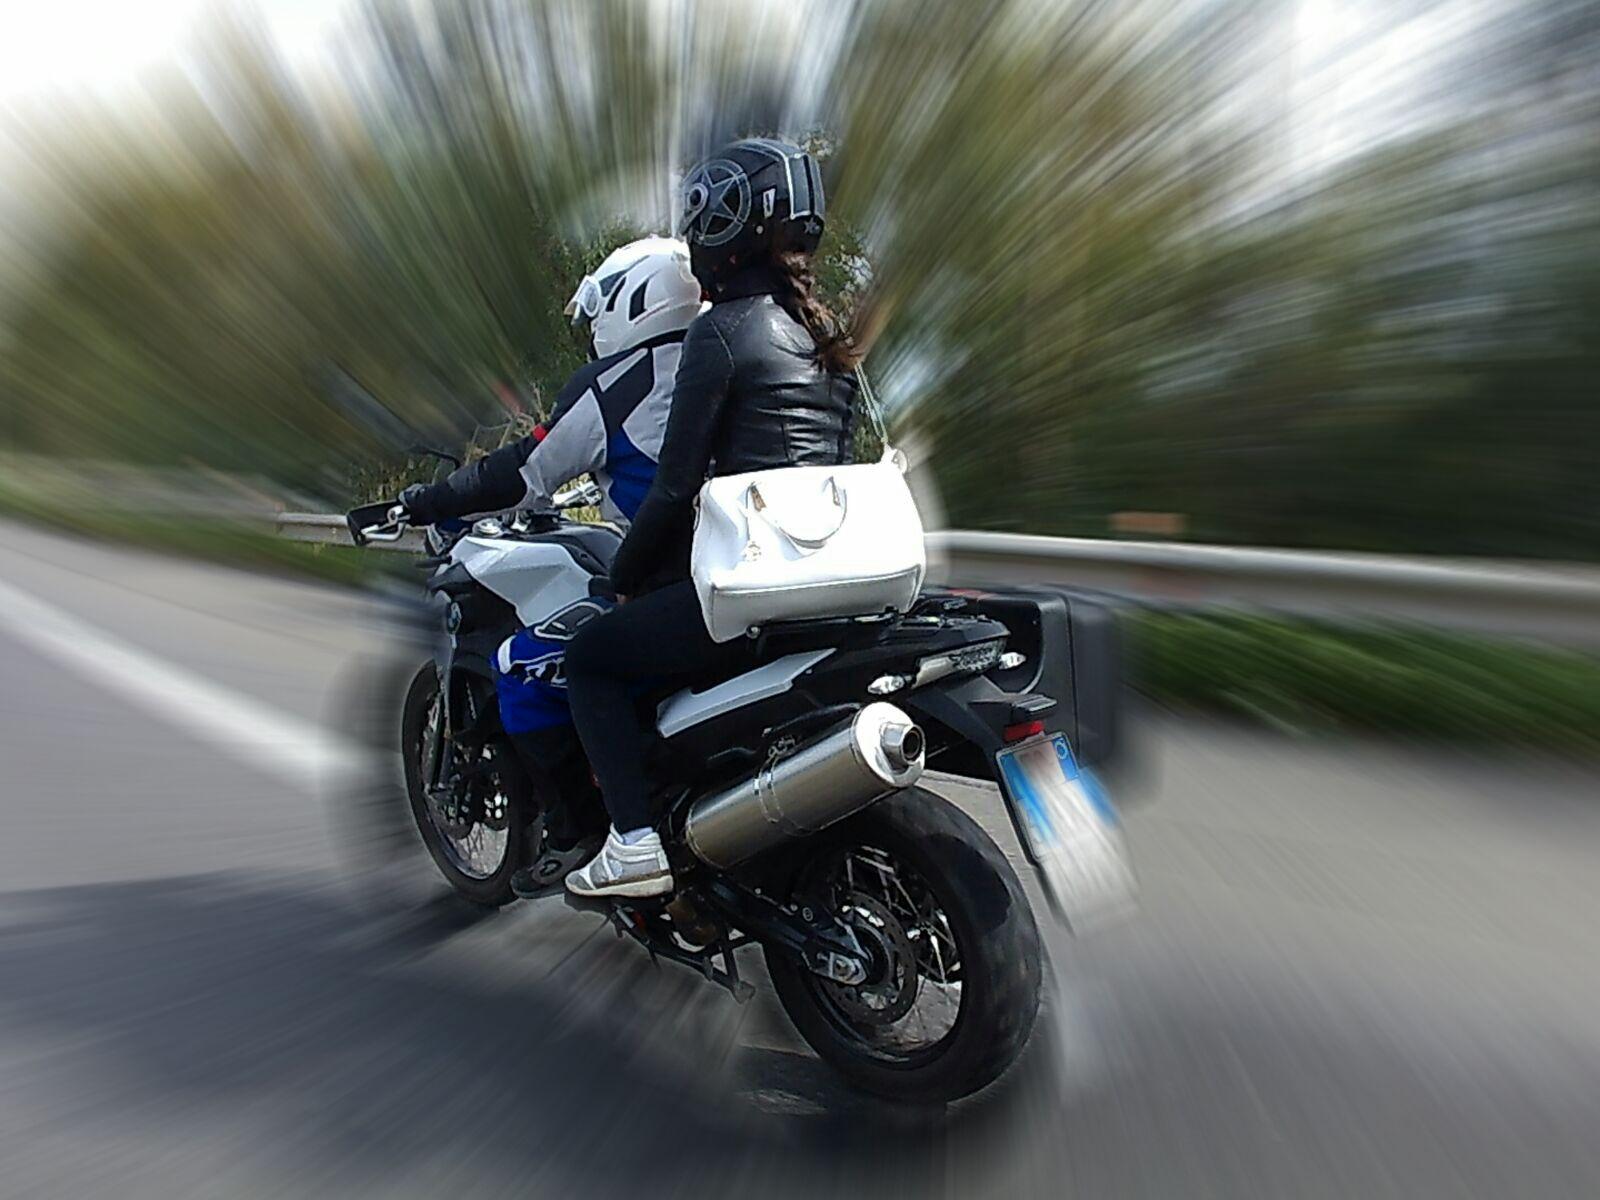 viaggi moto sicurezza comfort